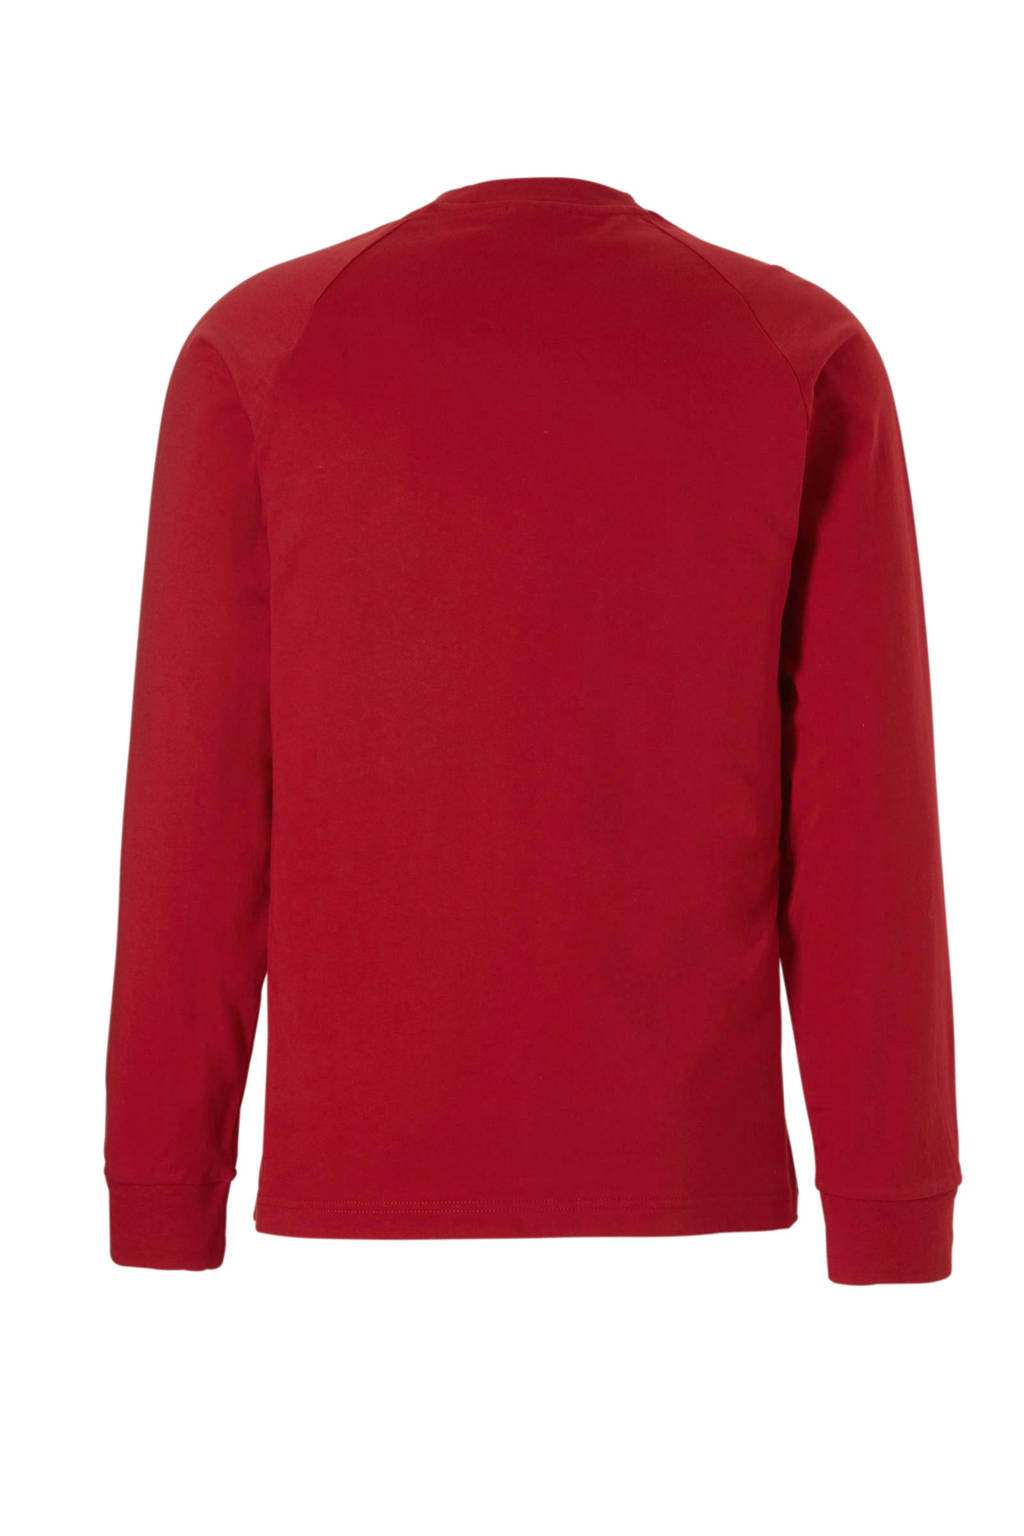 adidas originals   T-shirt, Rood/wit